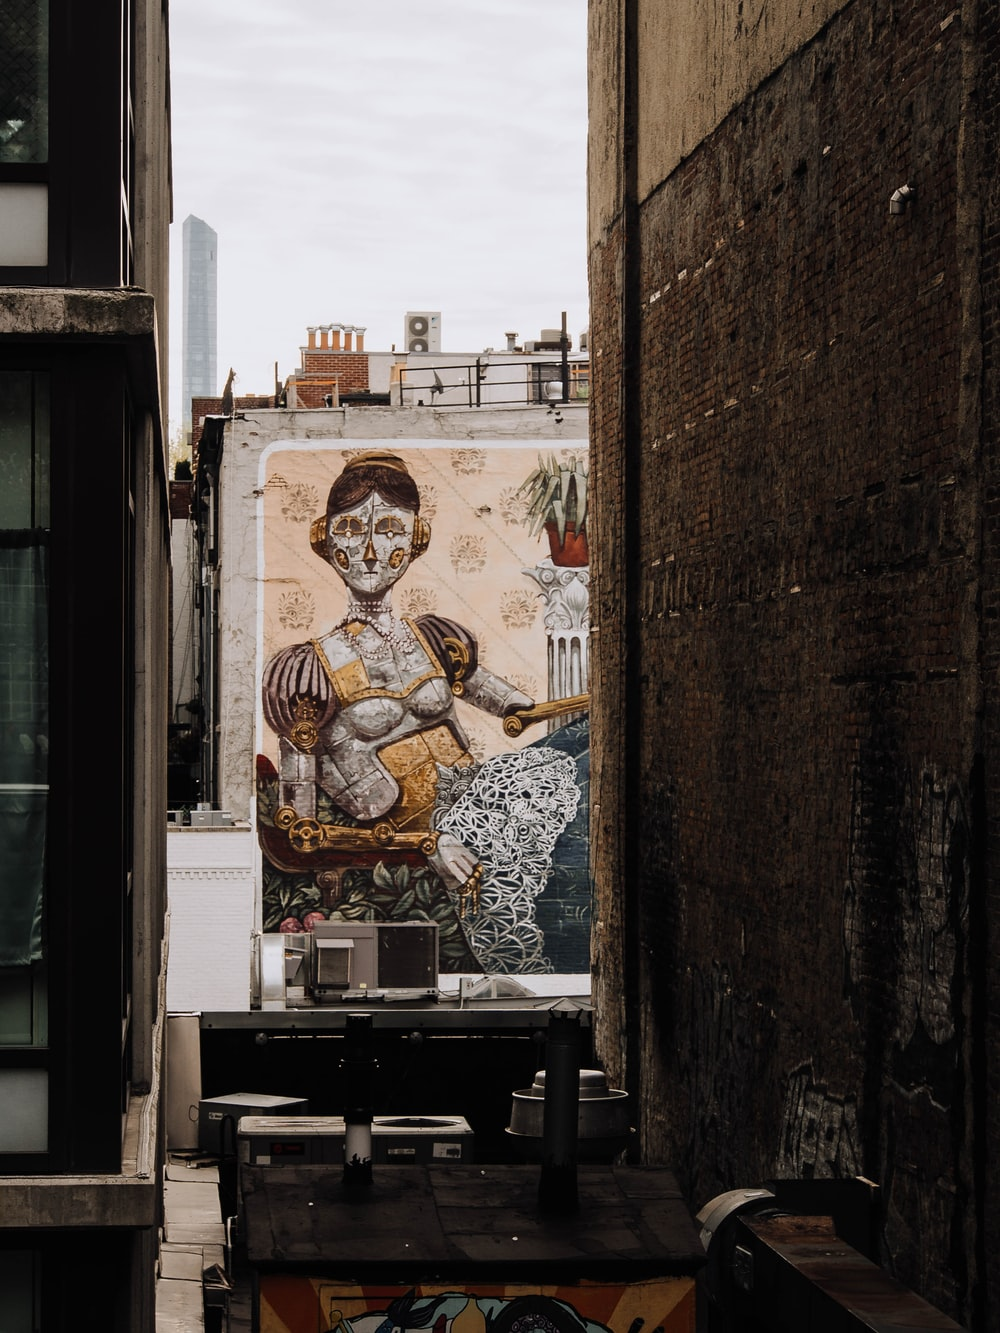 man in brown dress painting